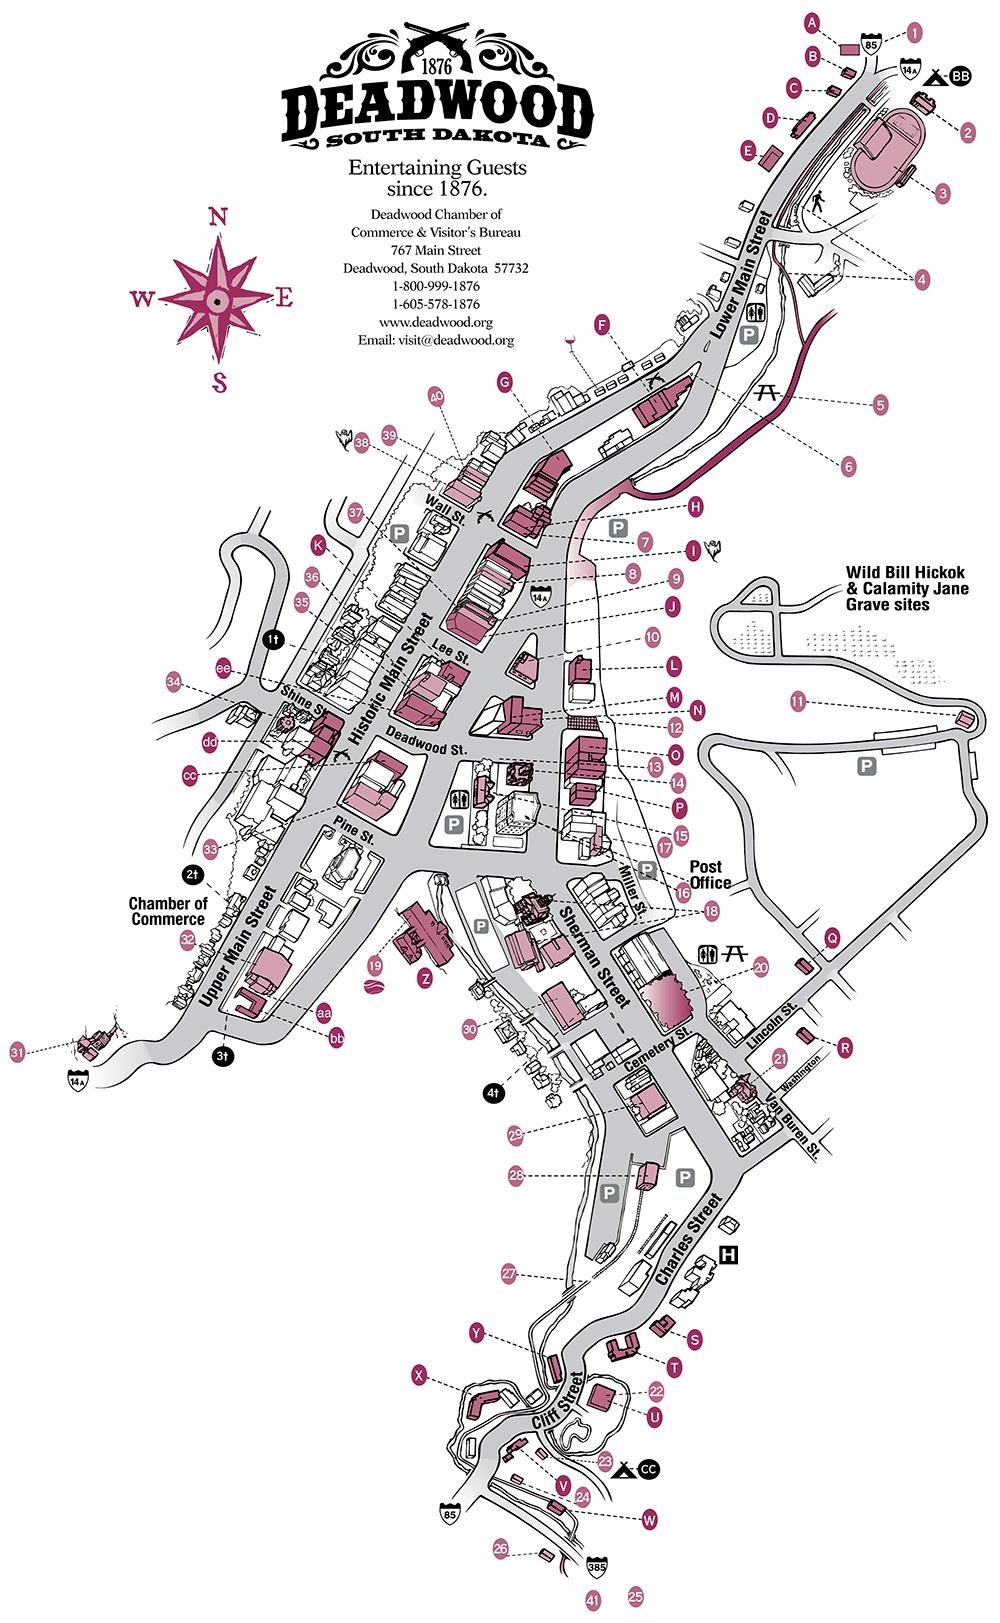 deadwood-tourism-map.png